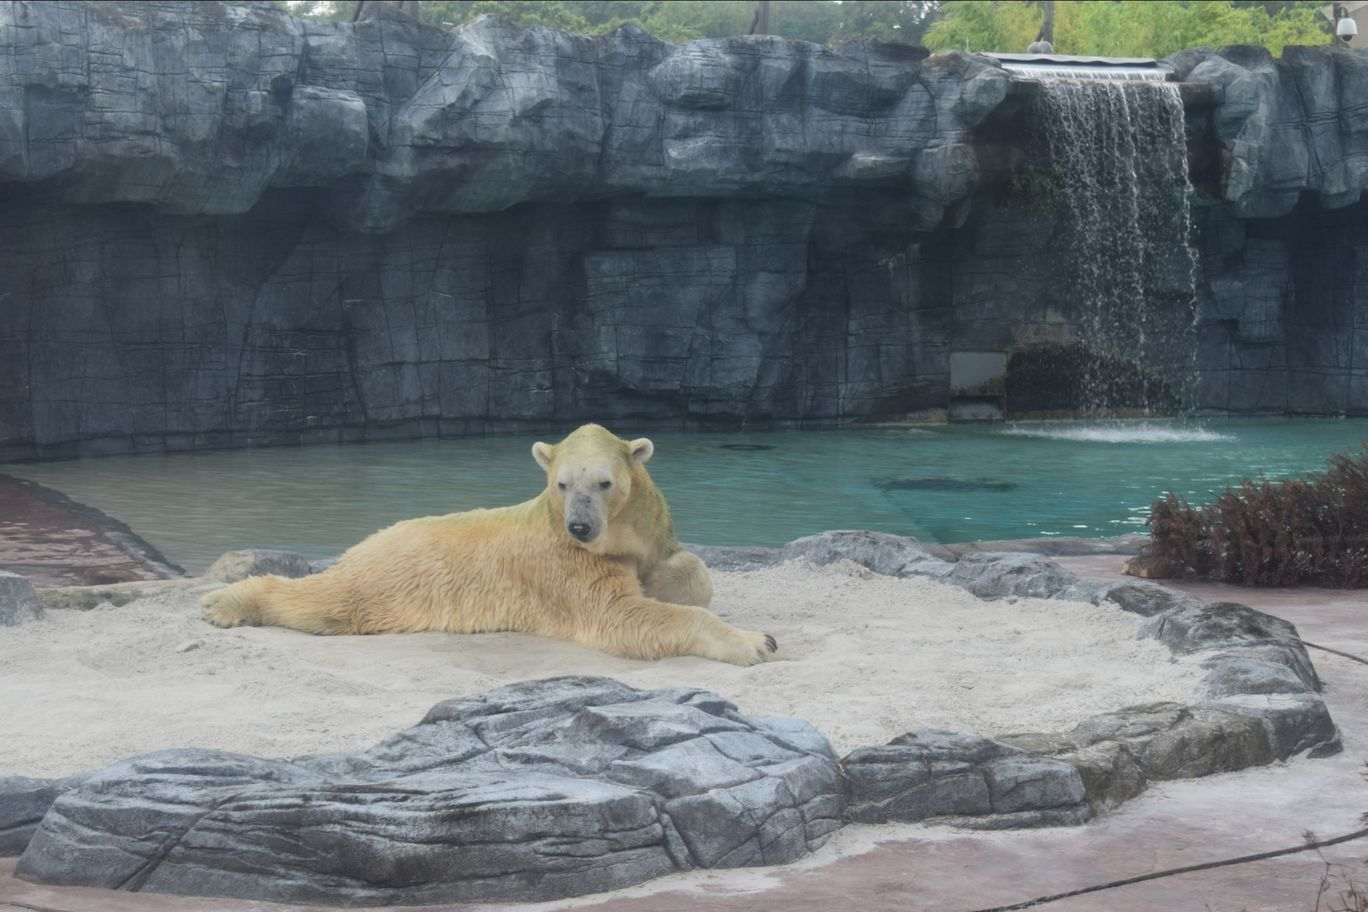 Photo of Singapore Zoo By La Vie en Rose